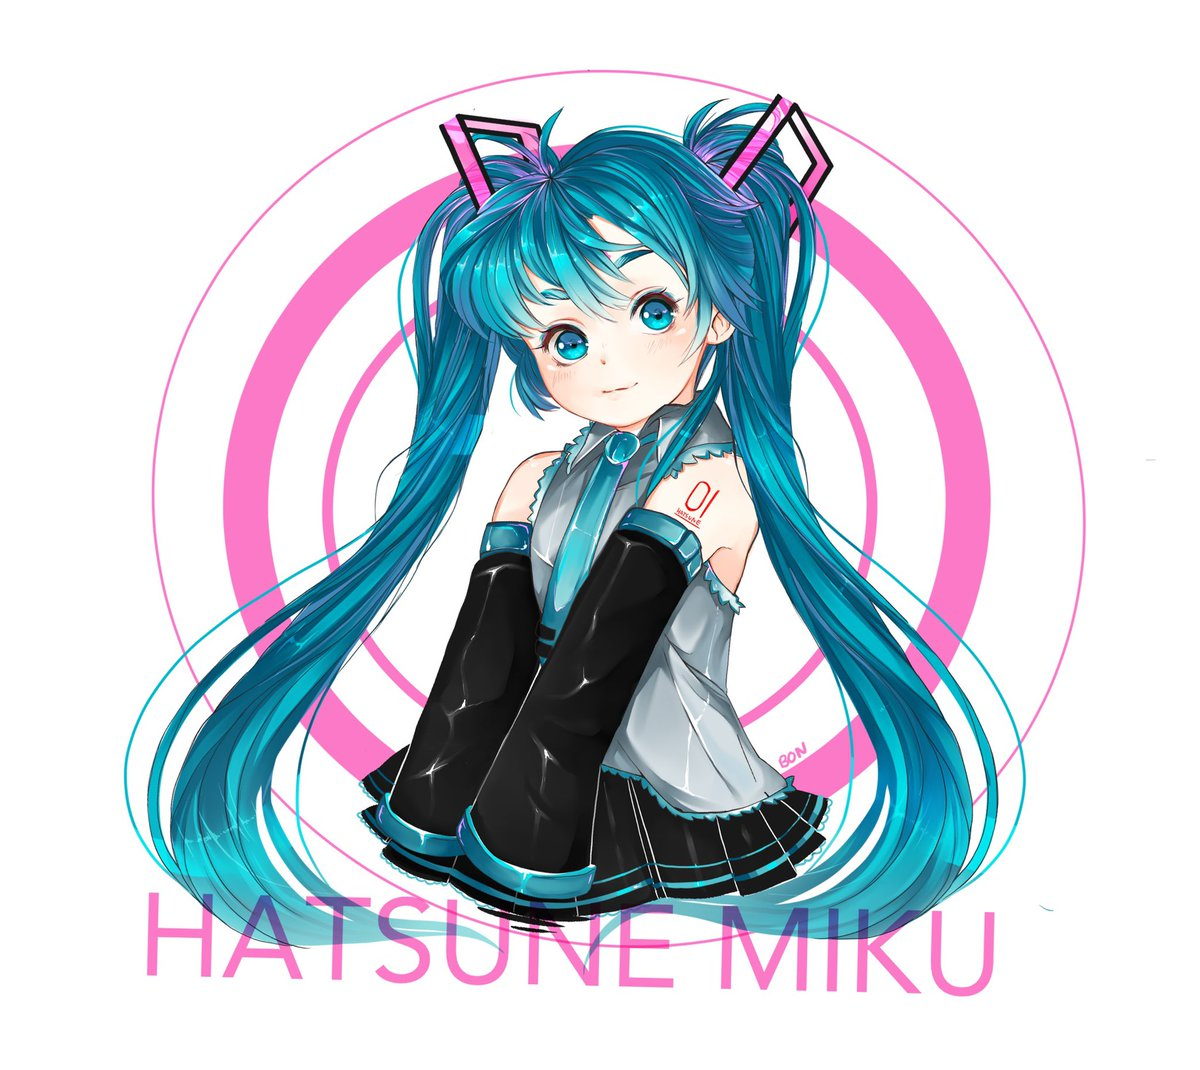 Finally finished this #HatsuneMiku fan art!   #CLIPSTUDIO   @cfm_miku_en @mikumiku_ebooks @clipstudiopaint <br>http://pic.twitter.com/SLycEkrRAL